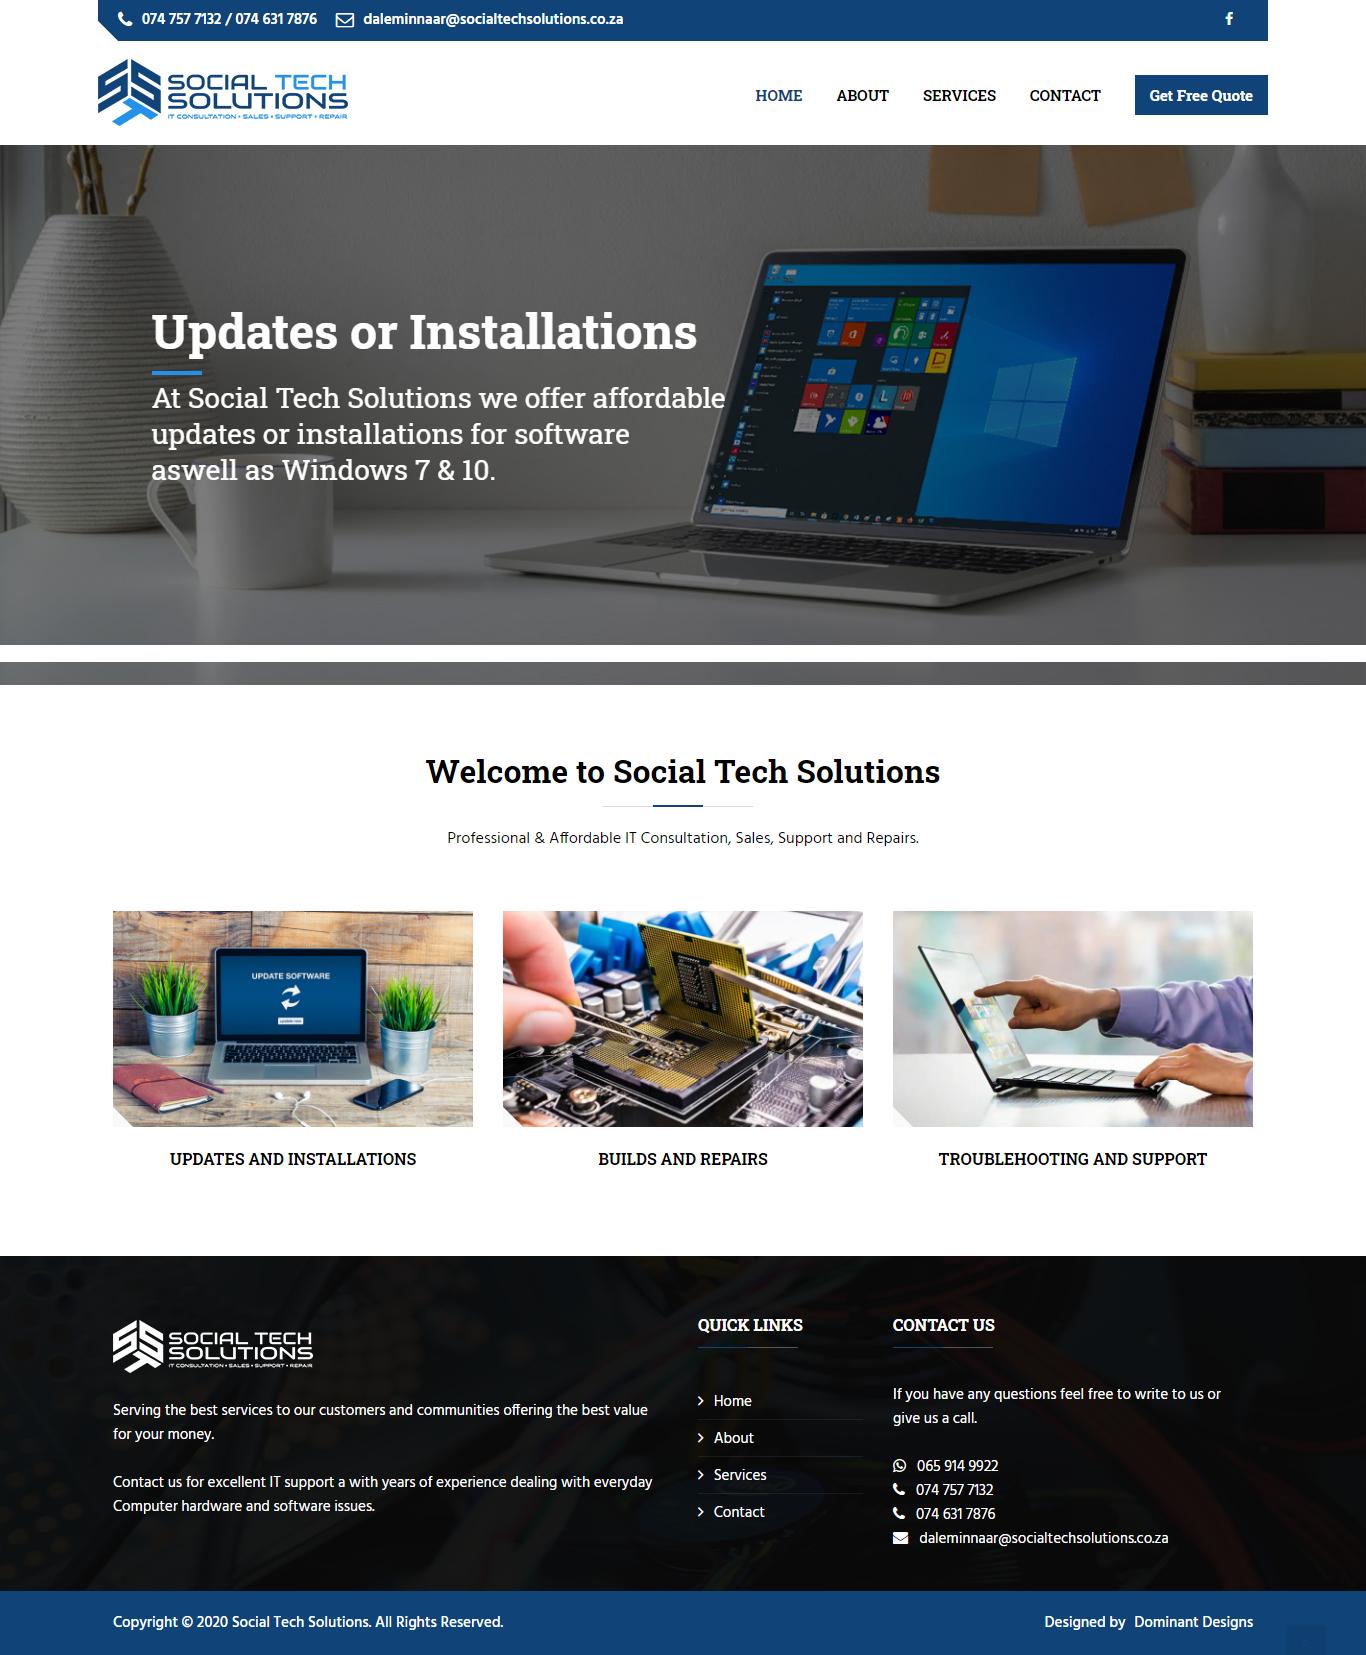 Social Tech Solutions Website Design